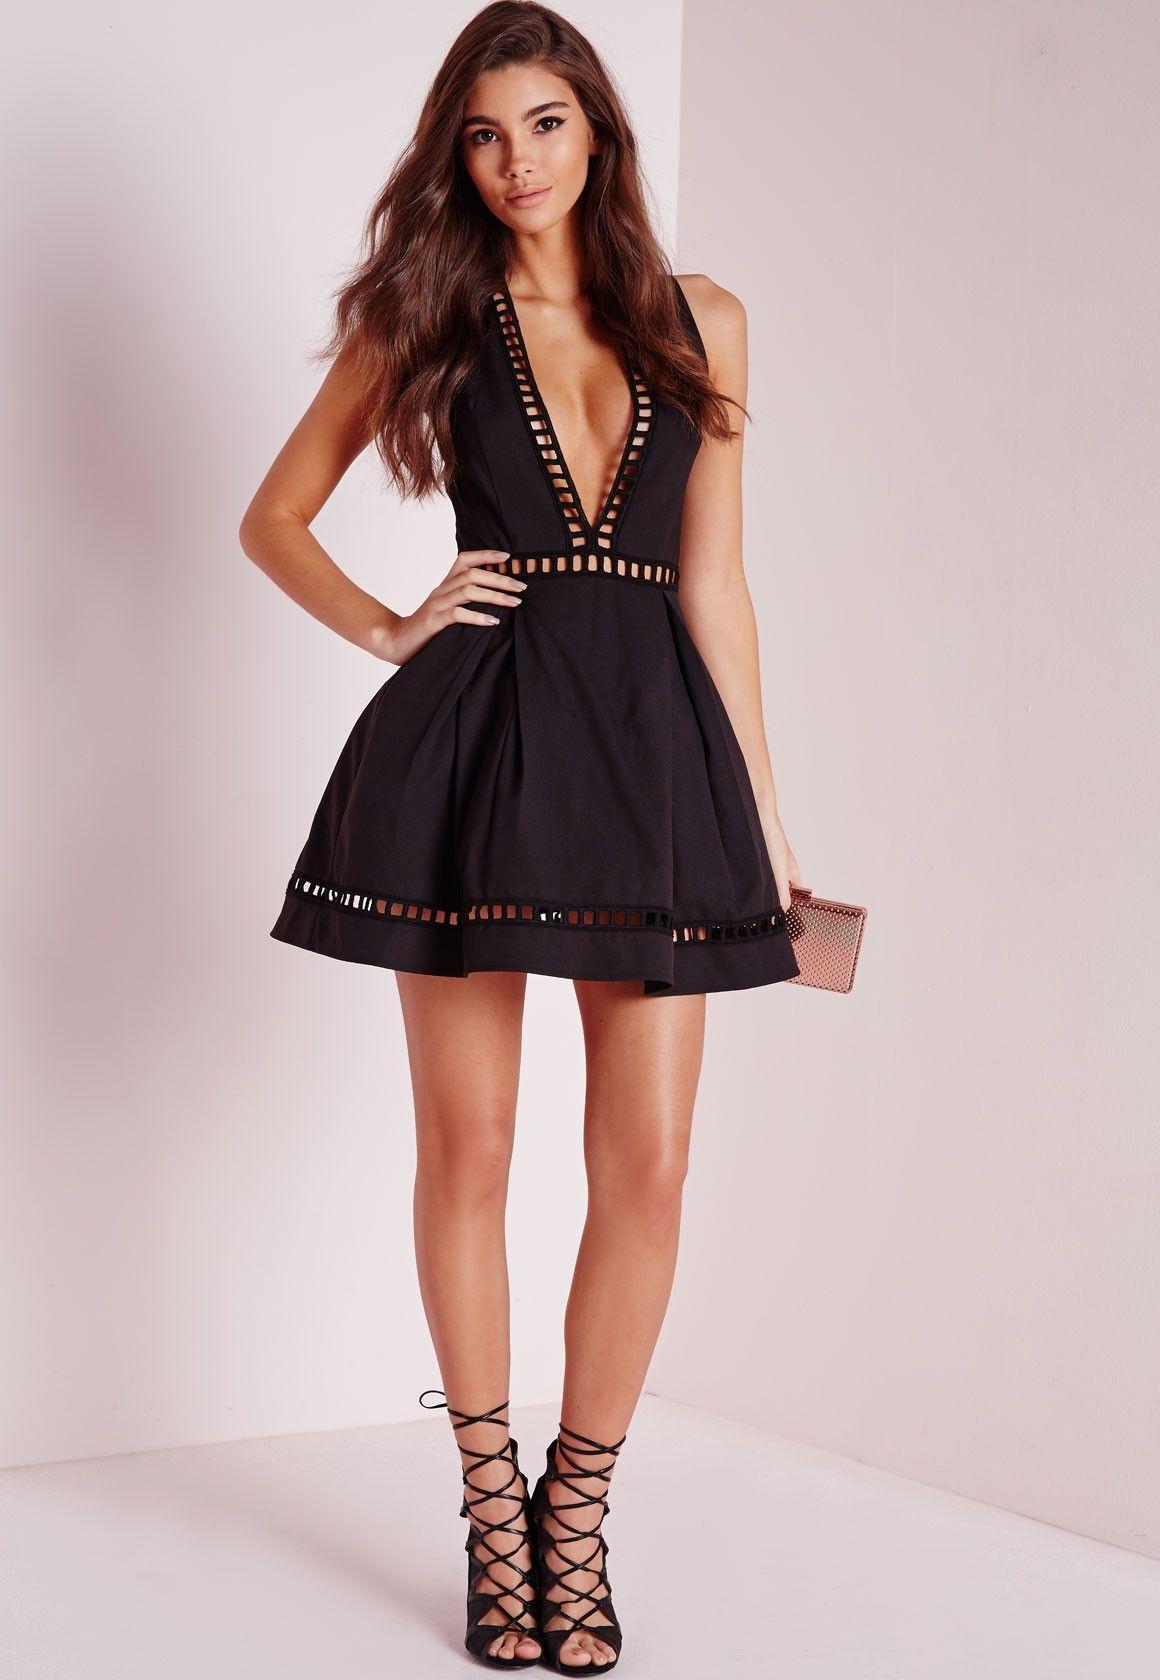 Missguided - Plunge Ladder Detail Skater Dress Black Short Dresses f66cb5458